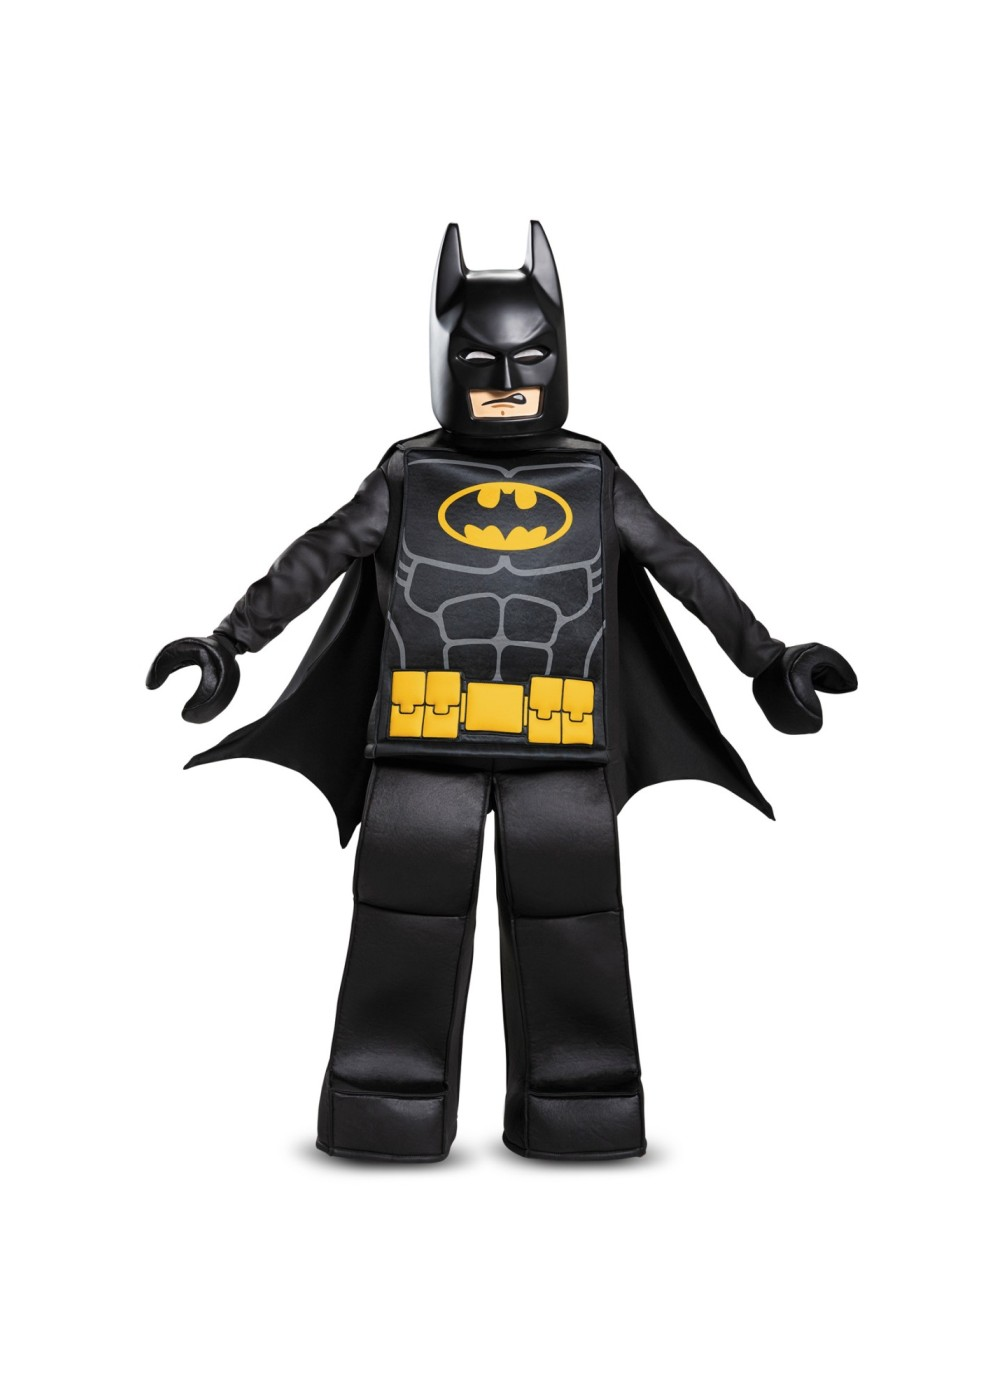 Batman Lego Movie Boys Costume - Superhero Costumes